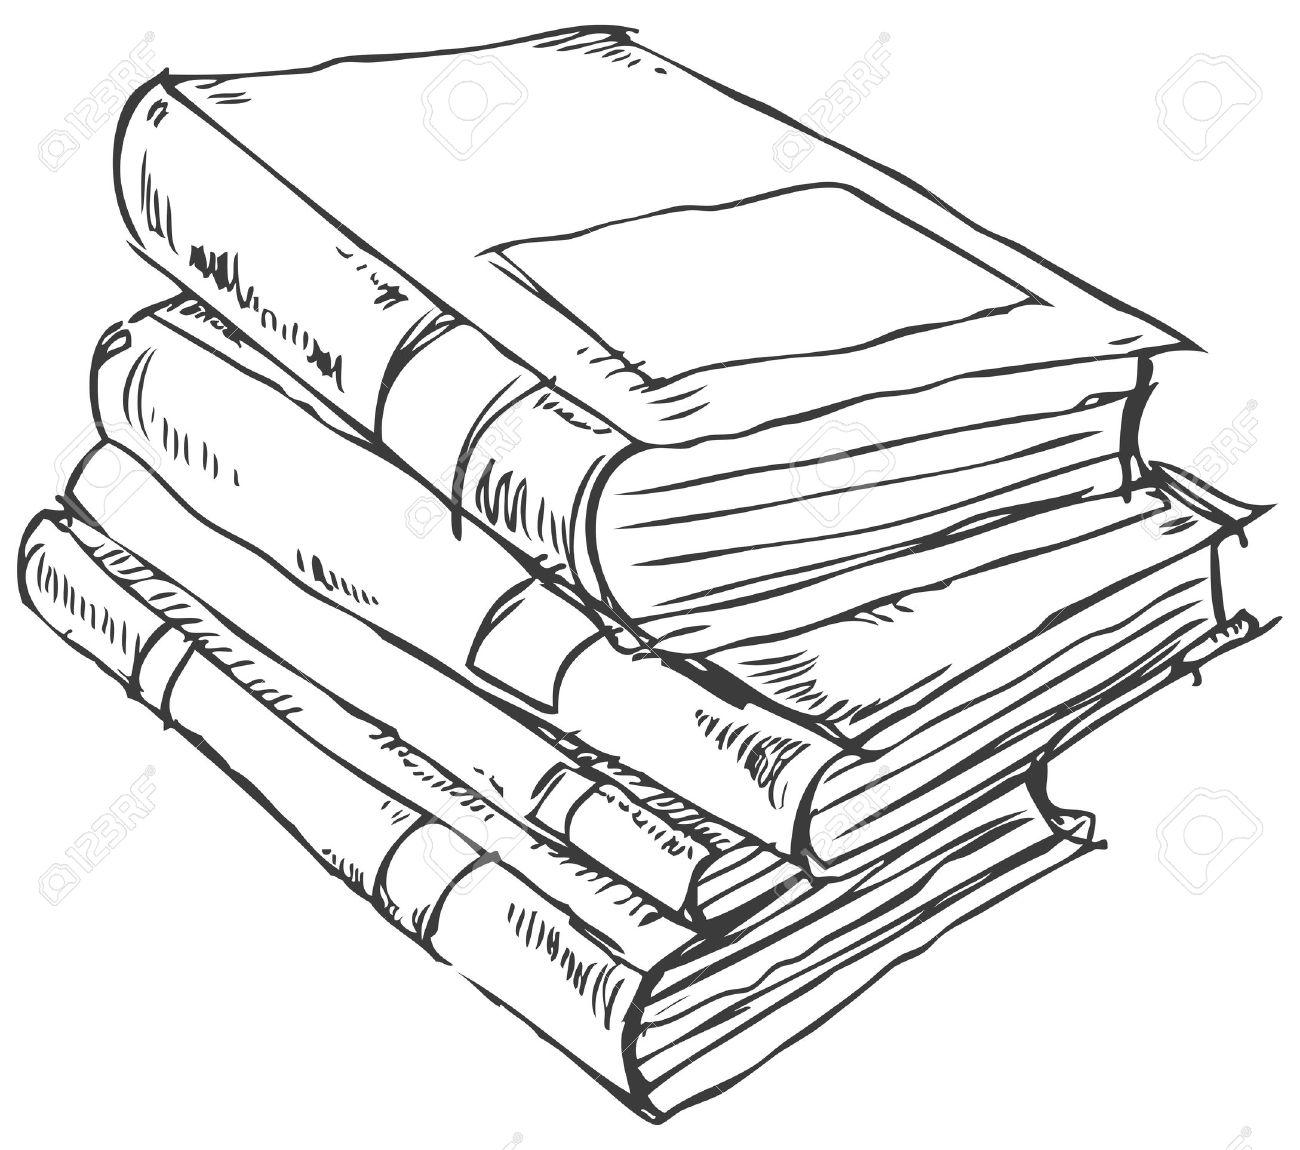 Bücherstapel gezeichnet  Bücherstapel Clipart Schwarz Weiß | grafffit.com